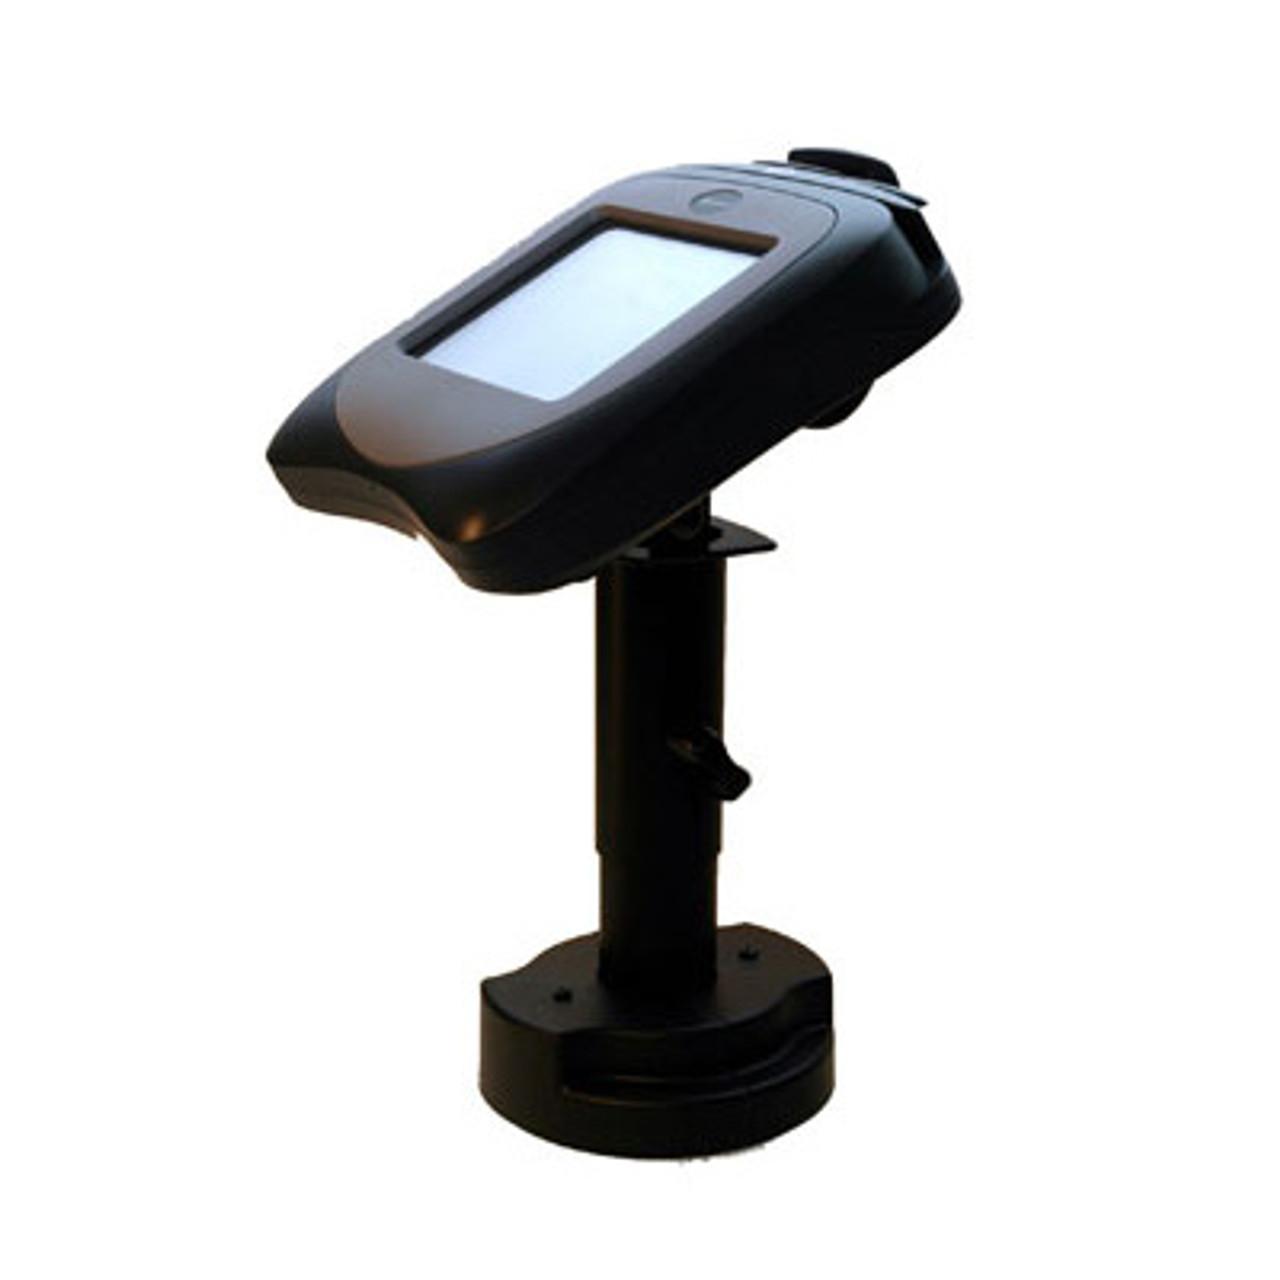 Swivel Stands Credit Card Stand Telescoping Pedestal VeriFone MX880